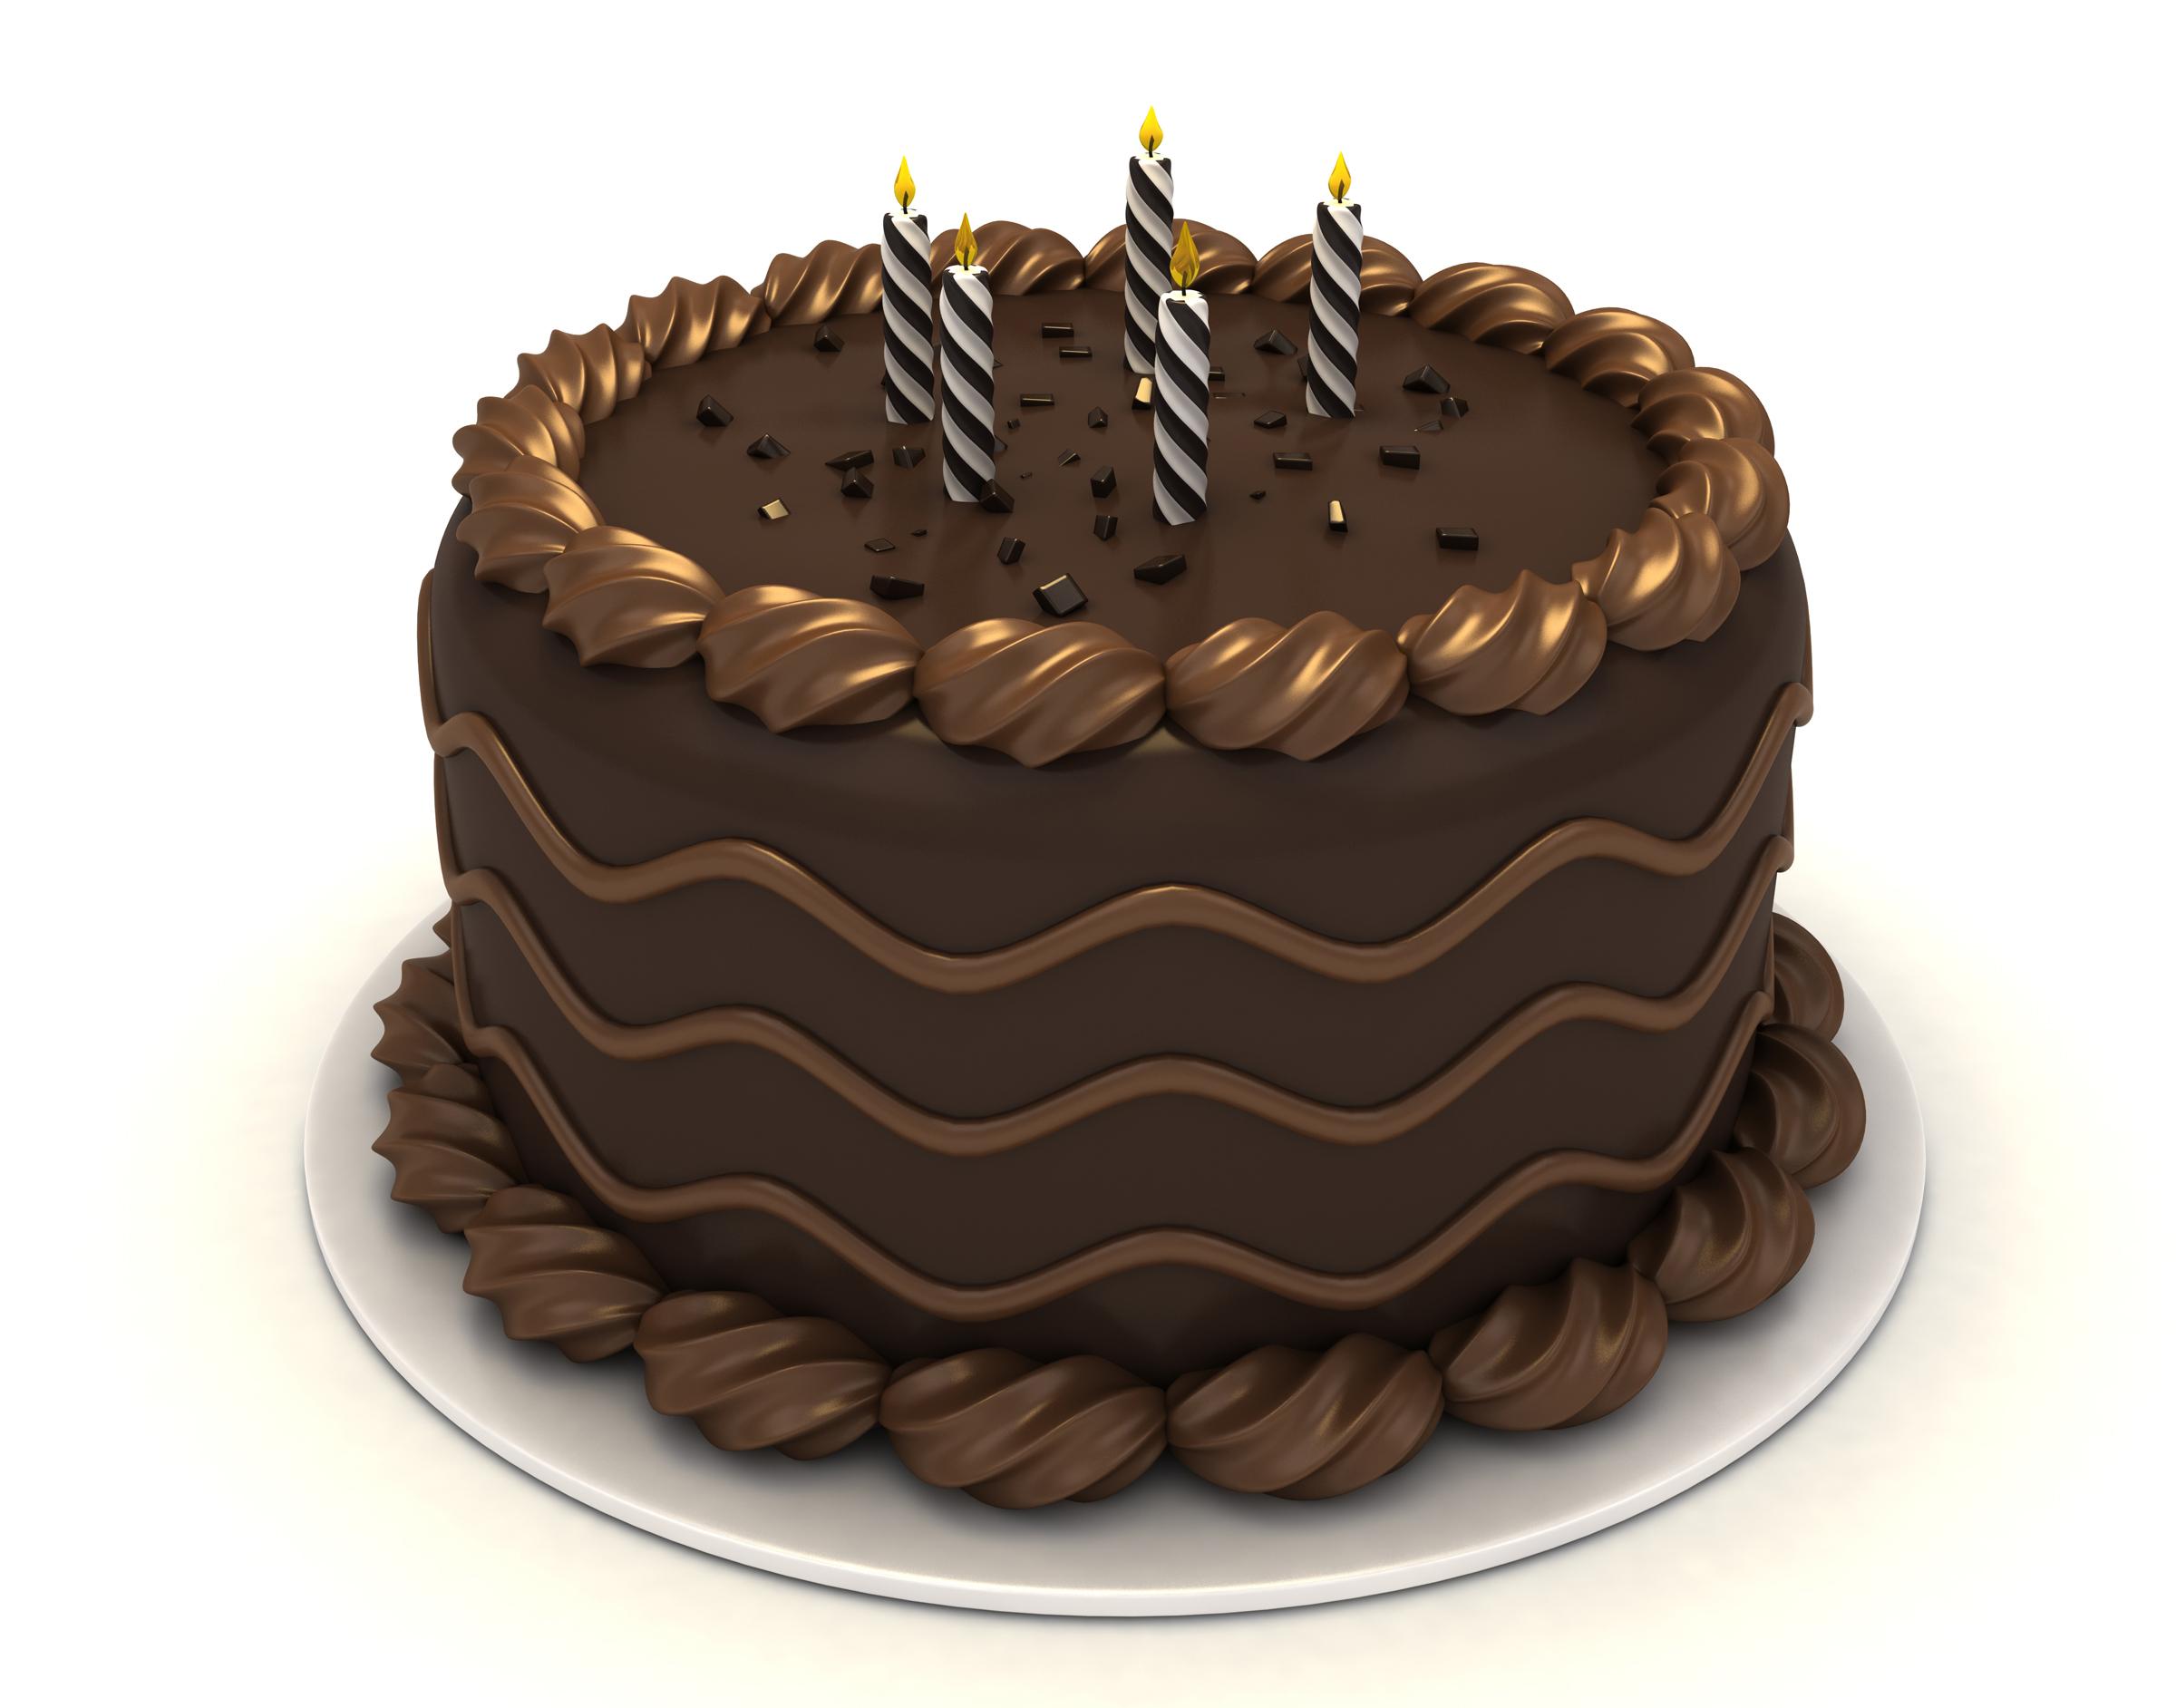 Chocolate Cake-Chocolate Cake-8